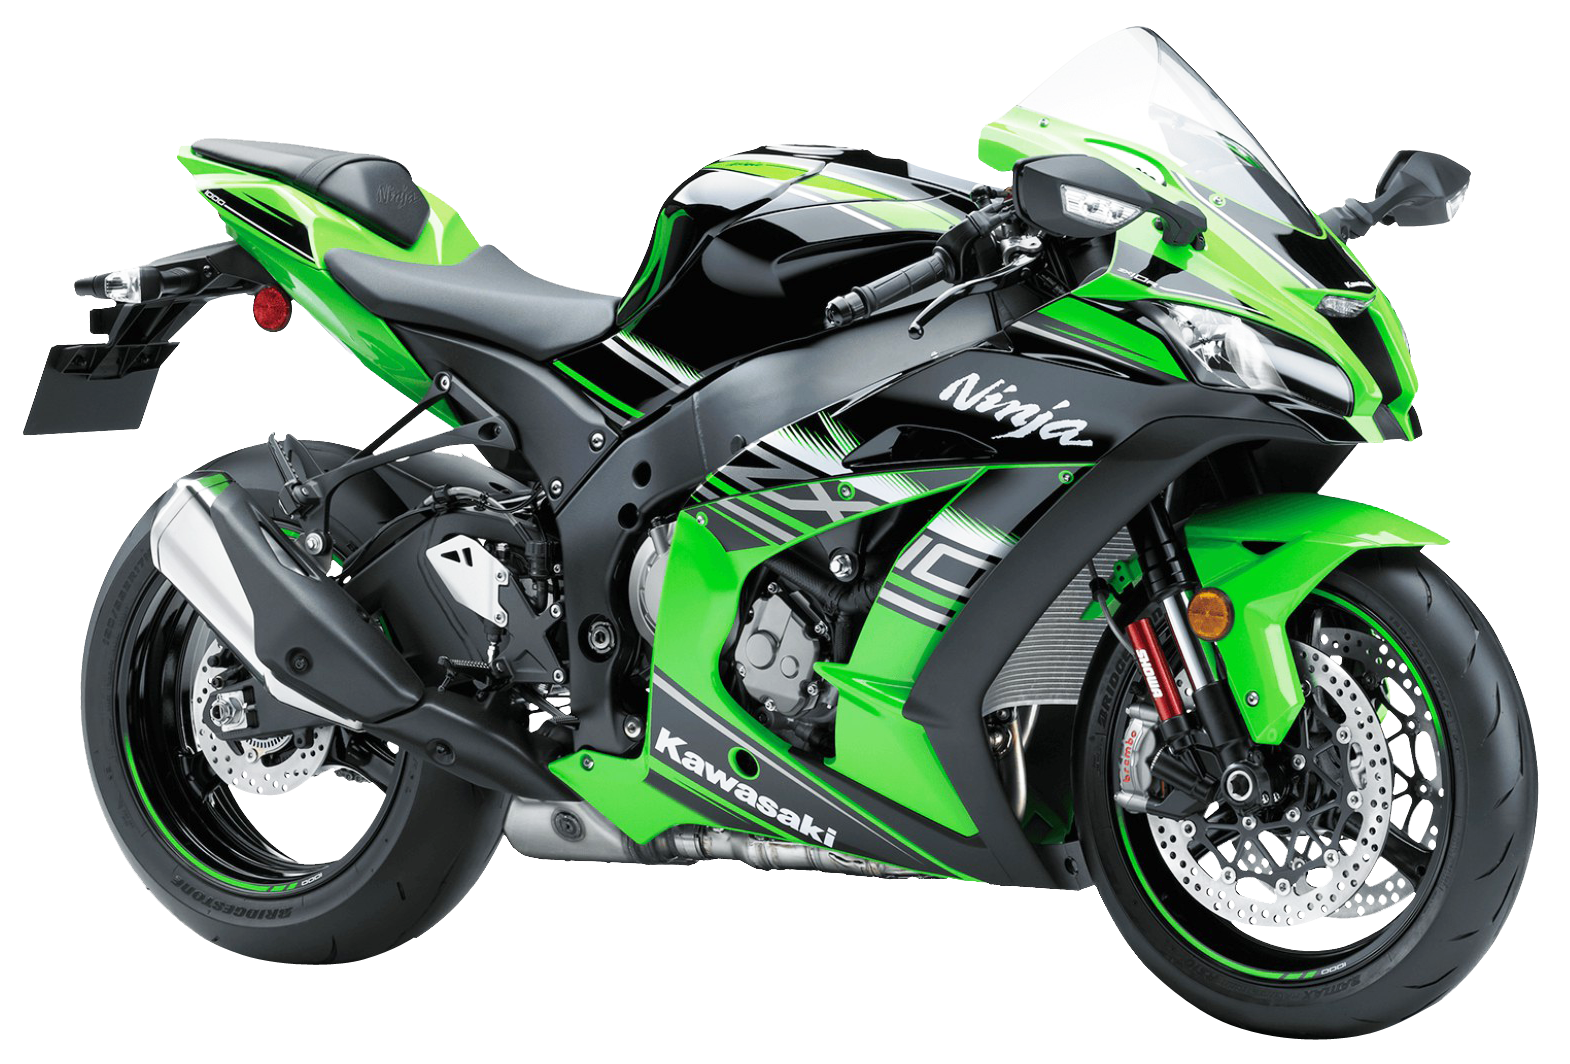 Motorcycle clipart hayabusa. Kawasaki ninja green bike